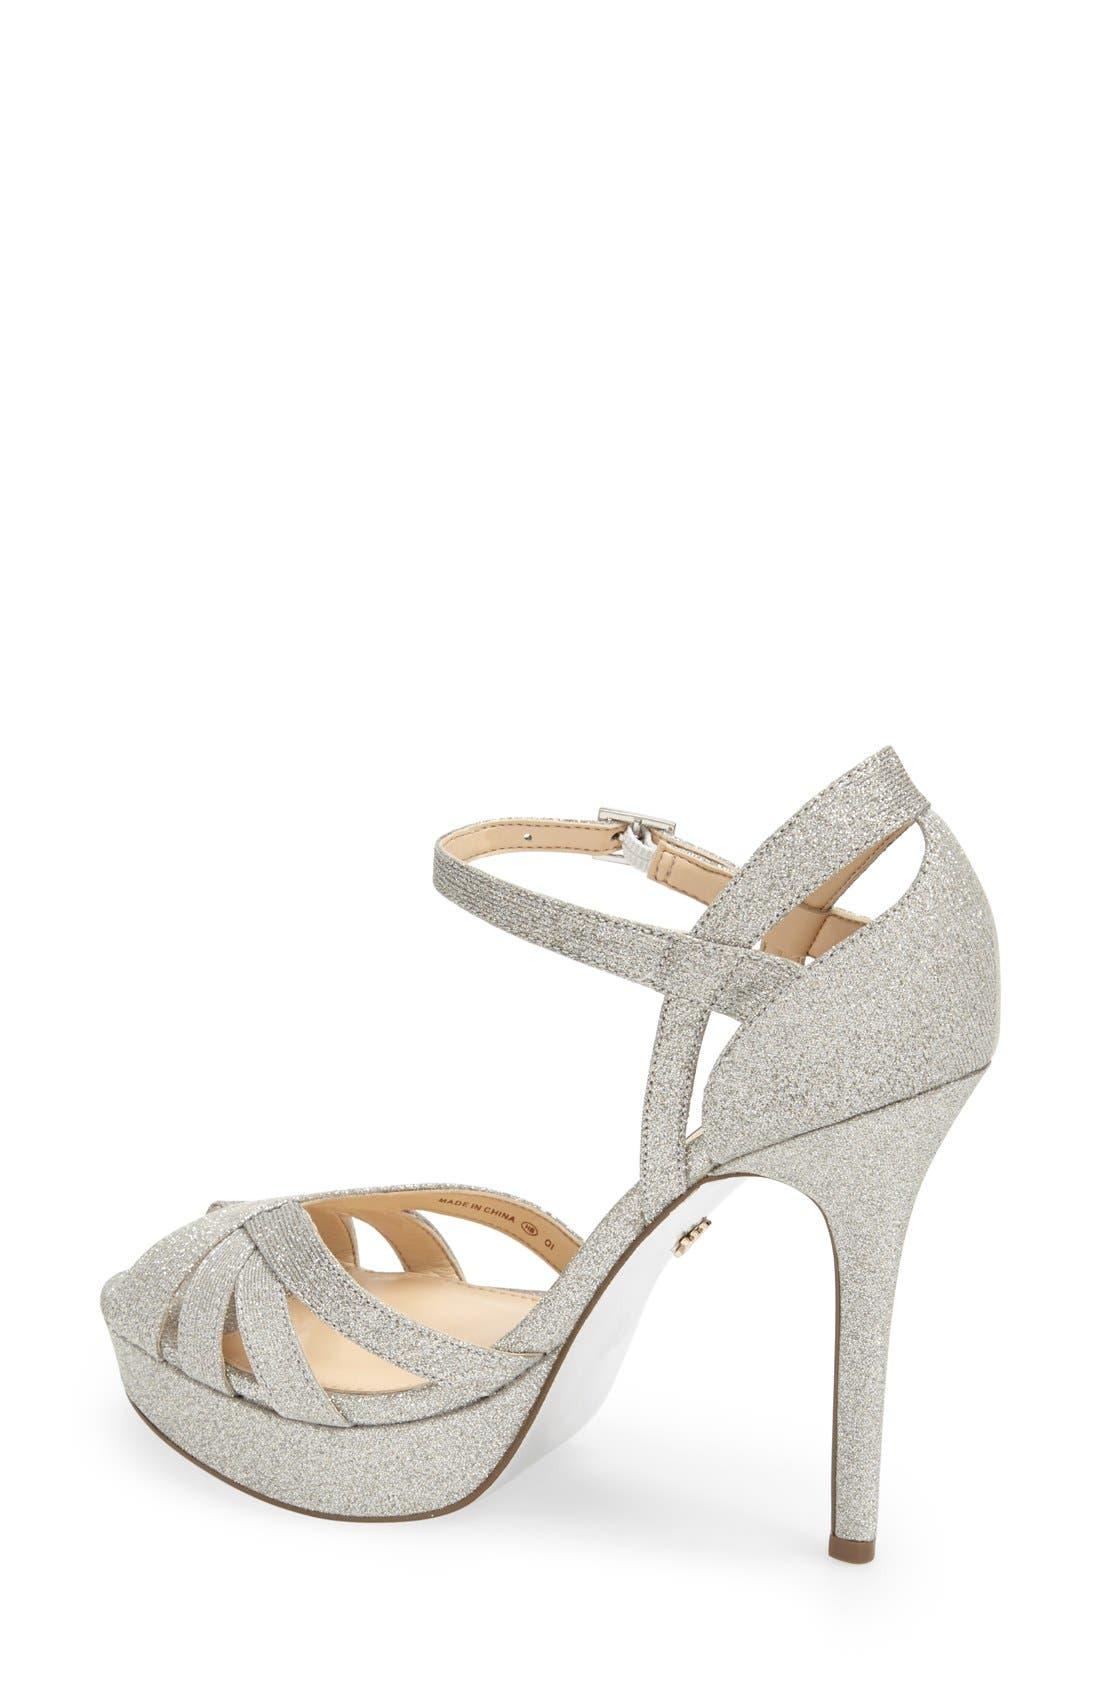 NINA, 'Senora' Glitter Satin Sandal, Alternate thumbnail 2, color, 042